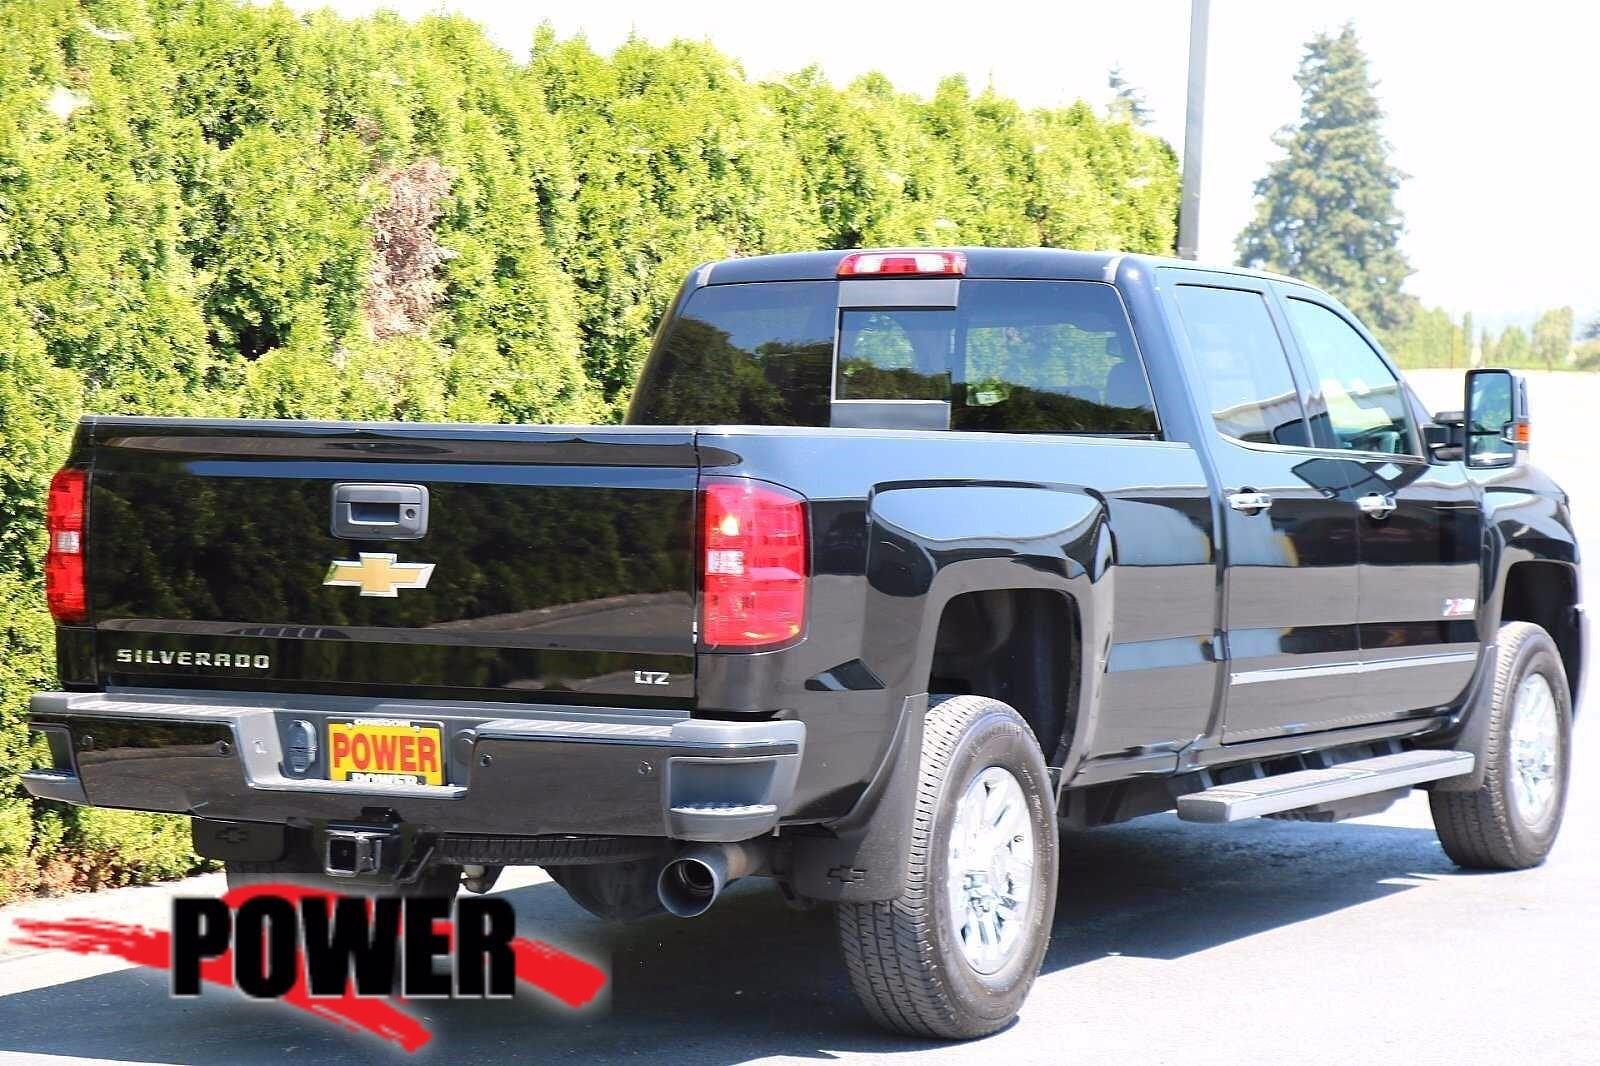 2019 Chevrolet Silverado 3500 Crew Cab 4x4, Pickup #24422A - photo 1